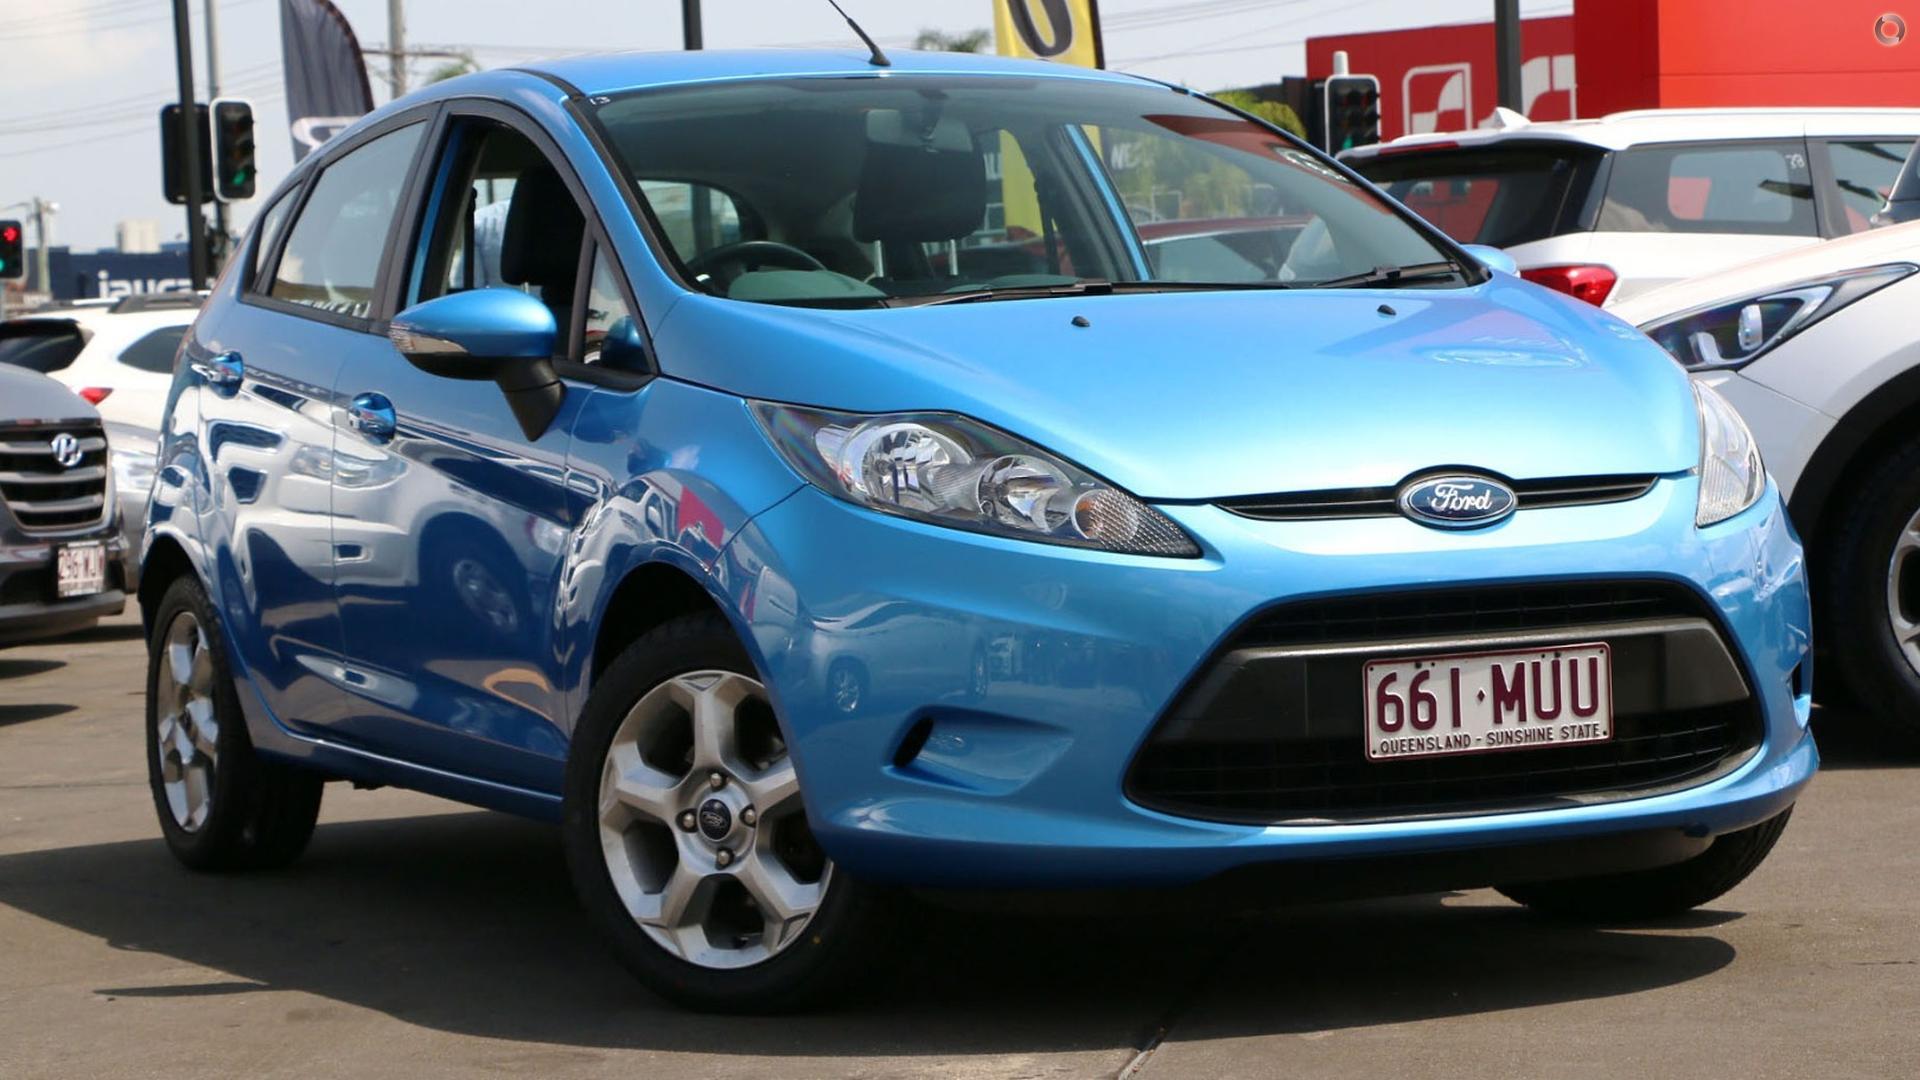 2008 Ford Fiesta WS